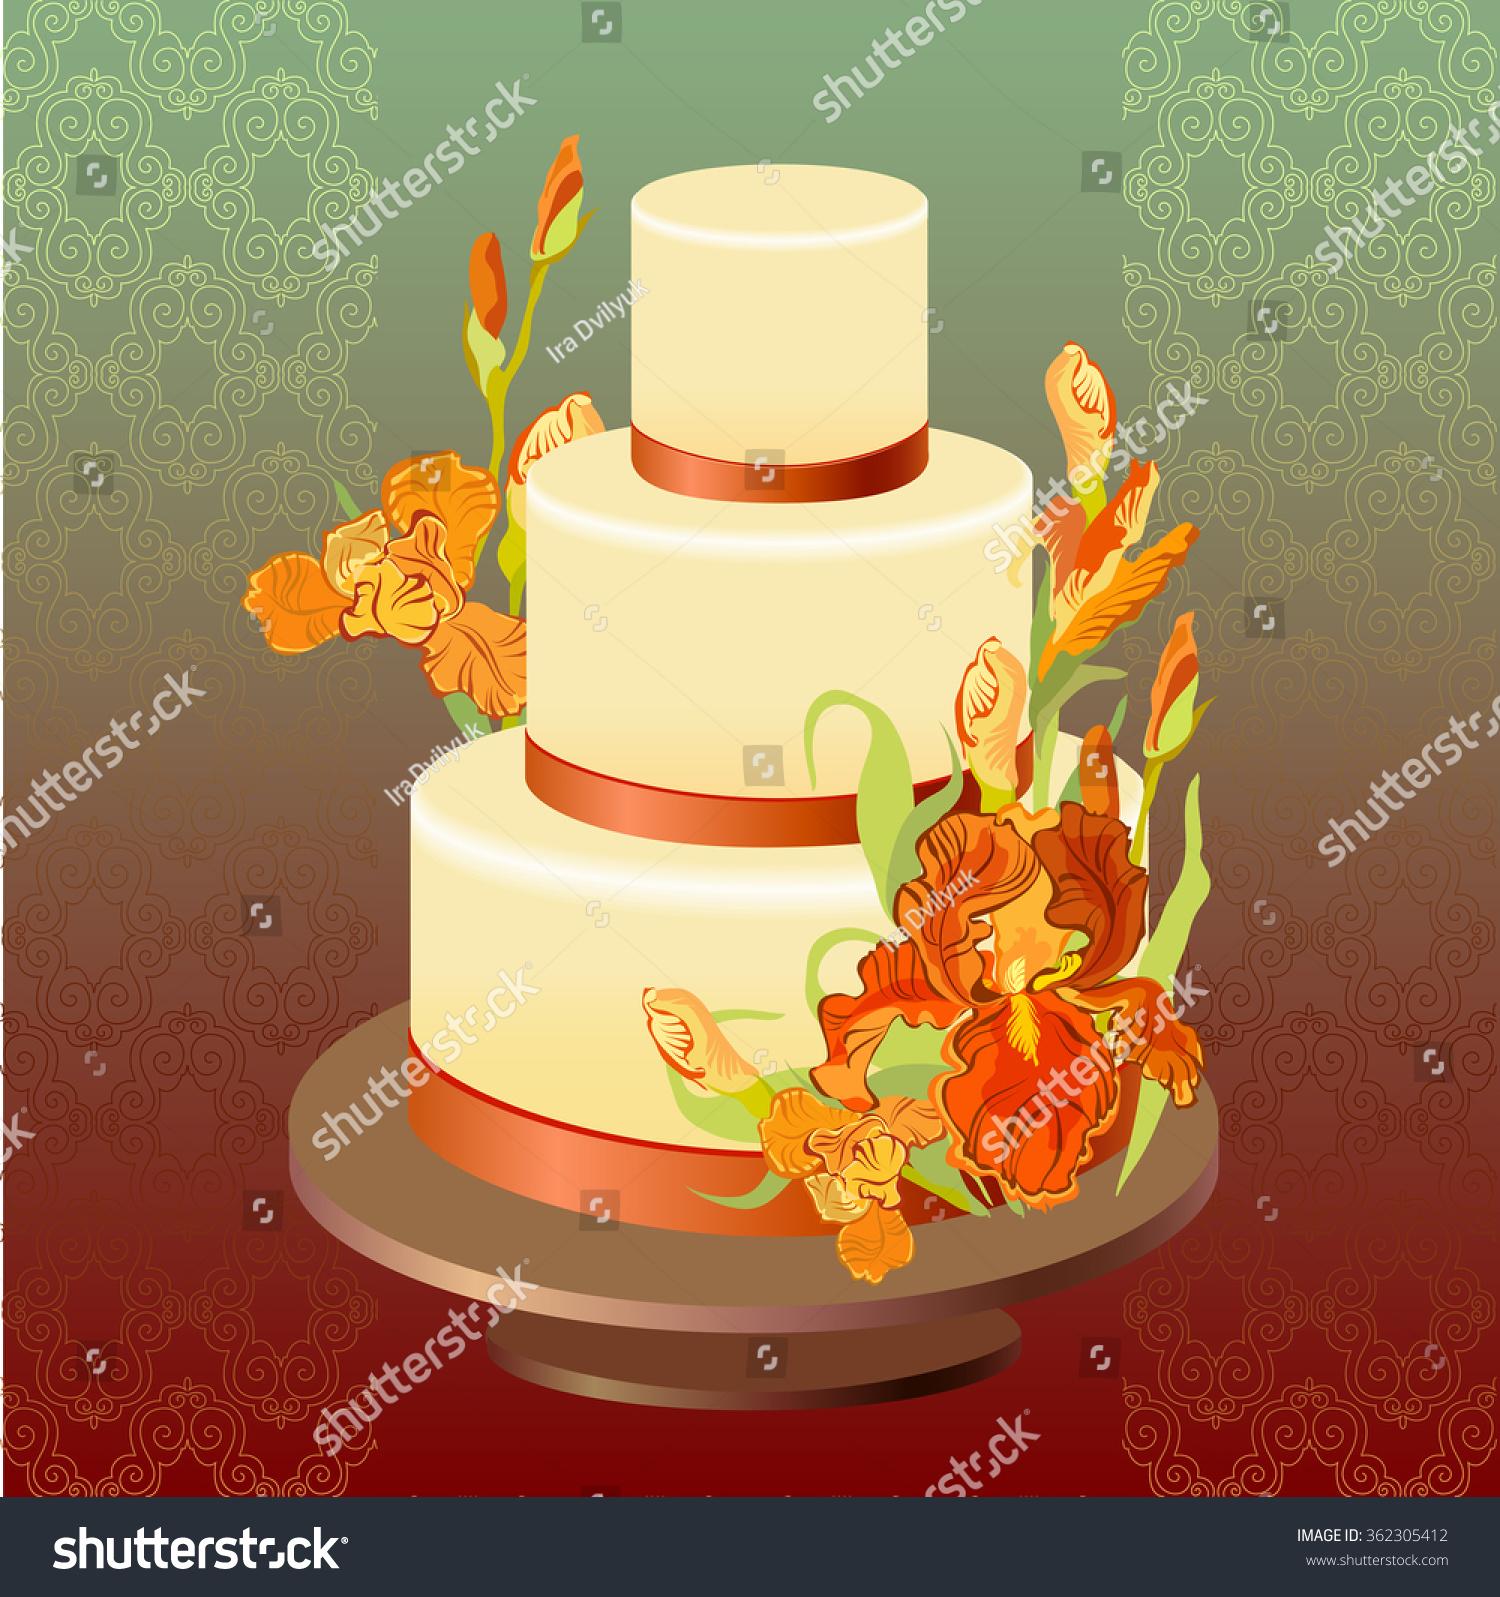 Wedding cake red orange yellow iris stock vector royalty free wedding cake with red orange yellow iris flowers beautiful wedding dessert mightylinksfo